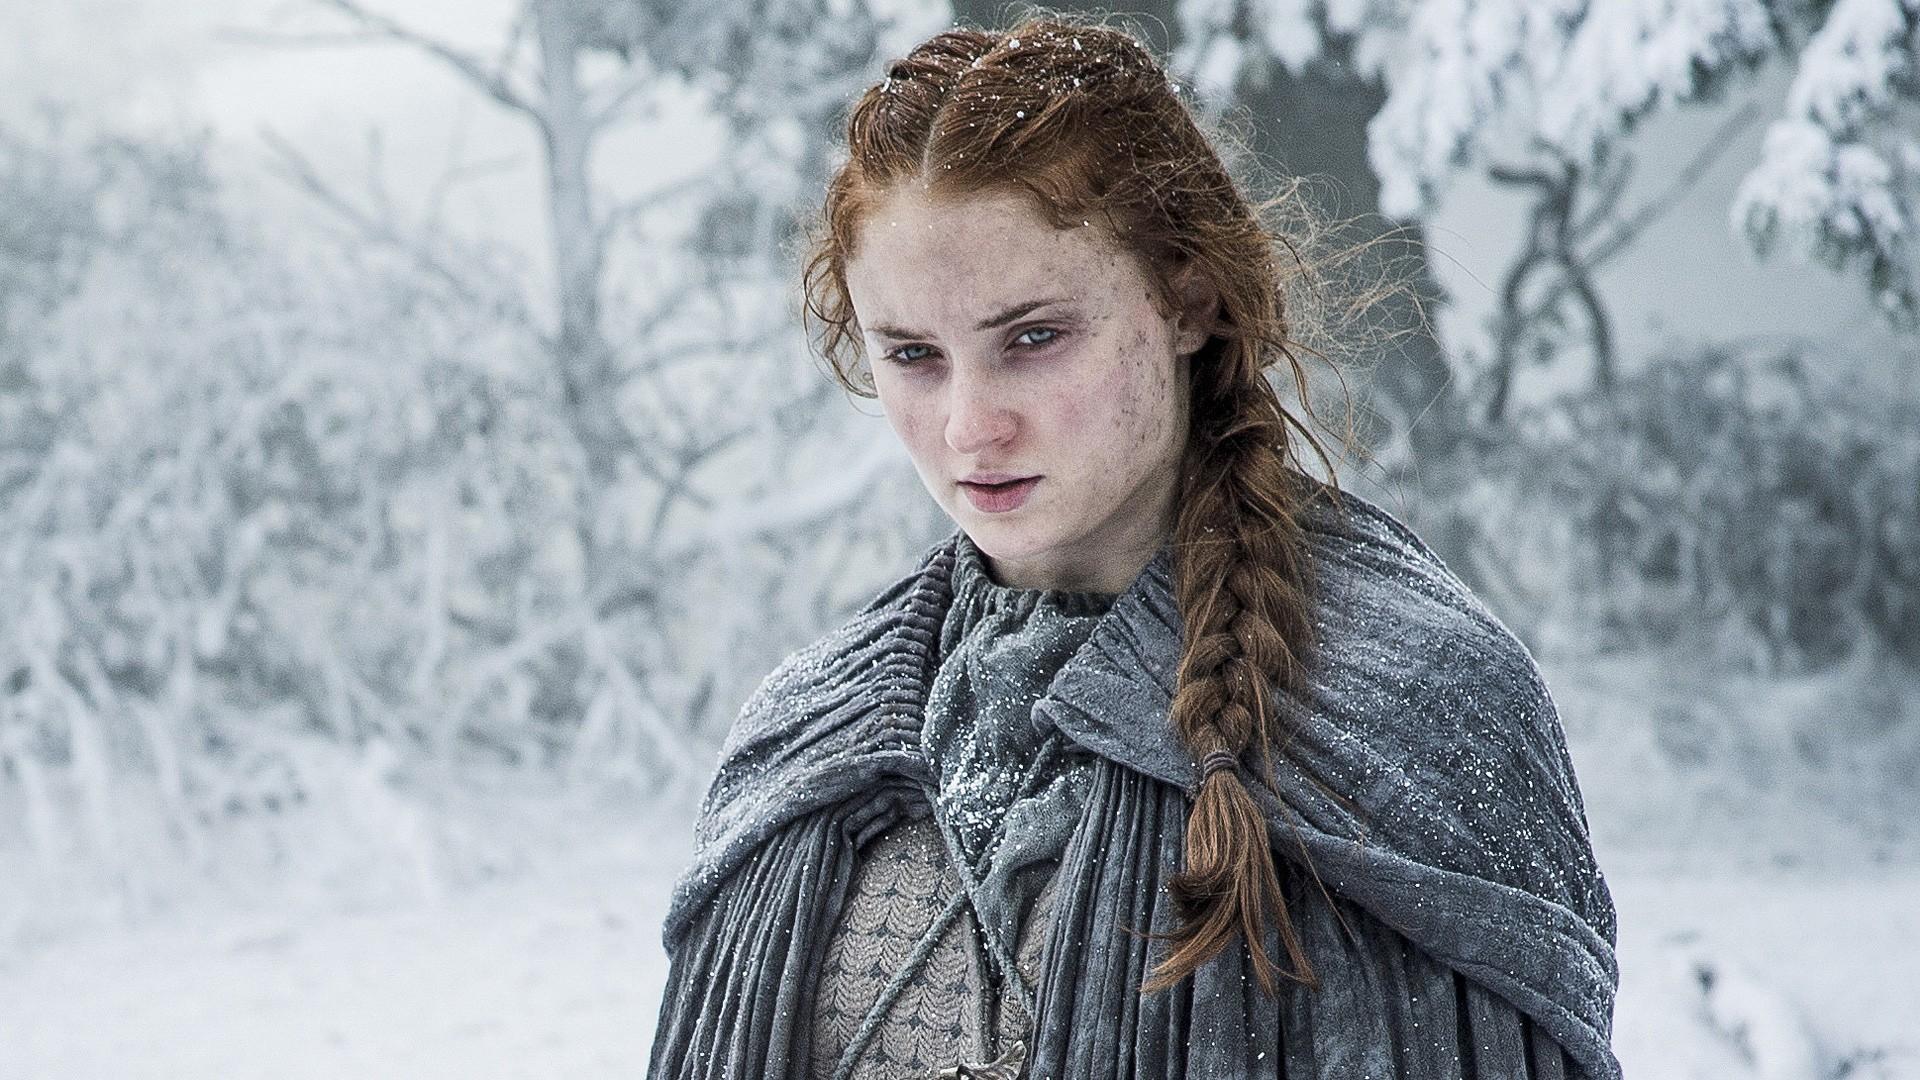 Hd Girls Of Game Of Thrones Wallpaper Sophie Turner Sansa Stark Game Of Thrones Season 6